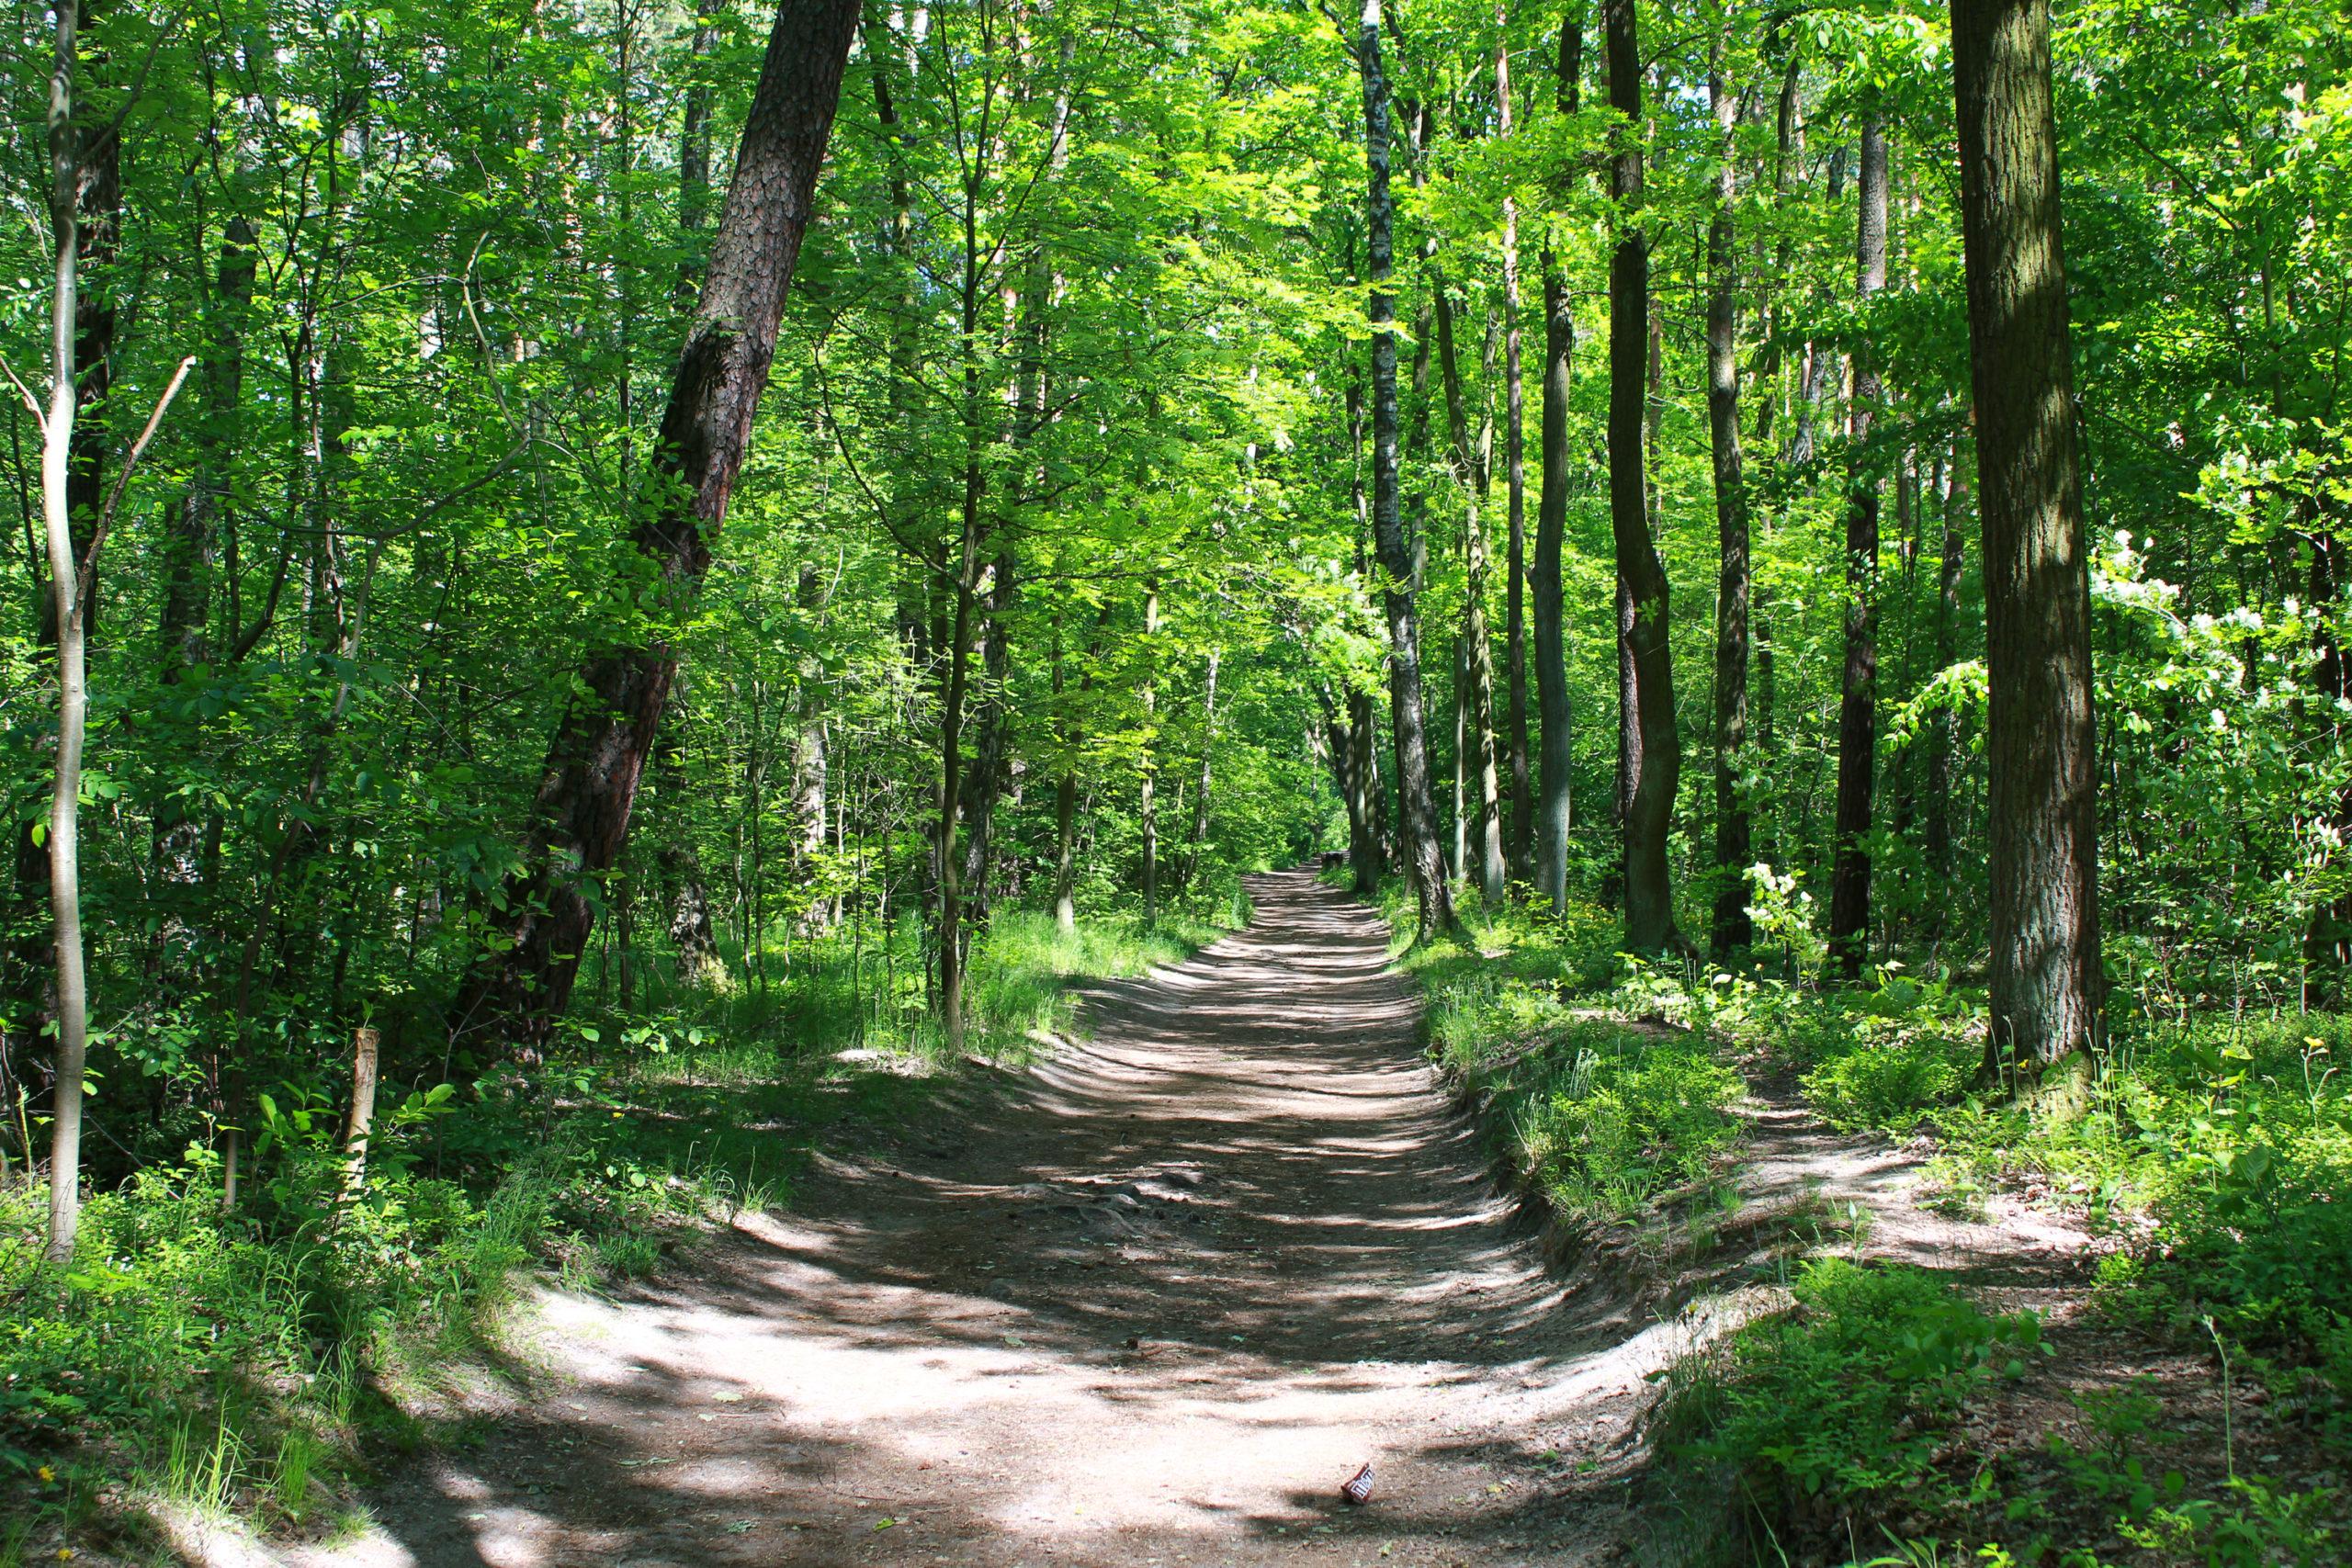 Las Kabacki droga w lesie